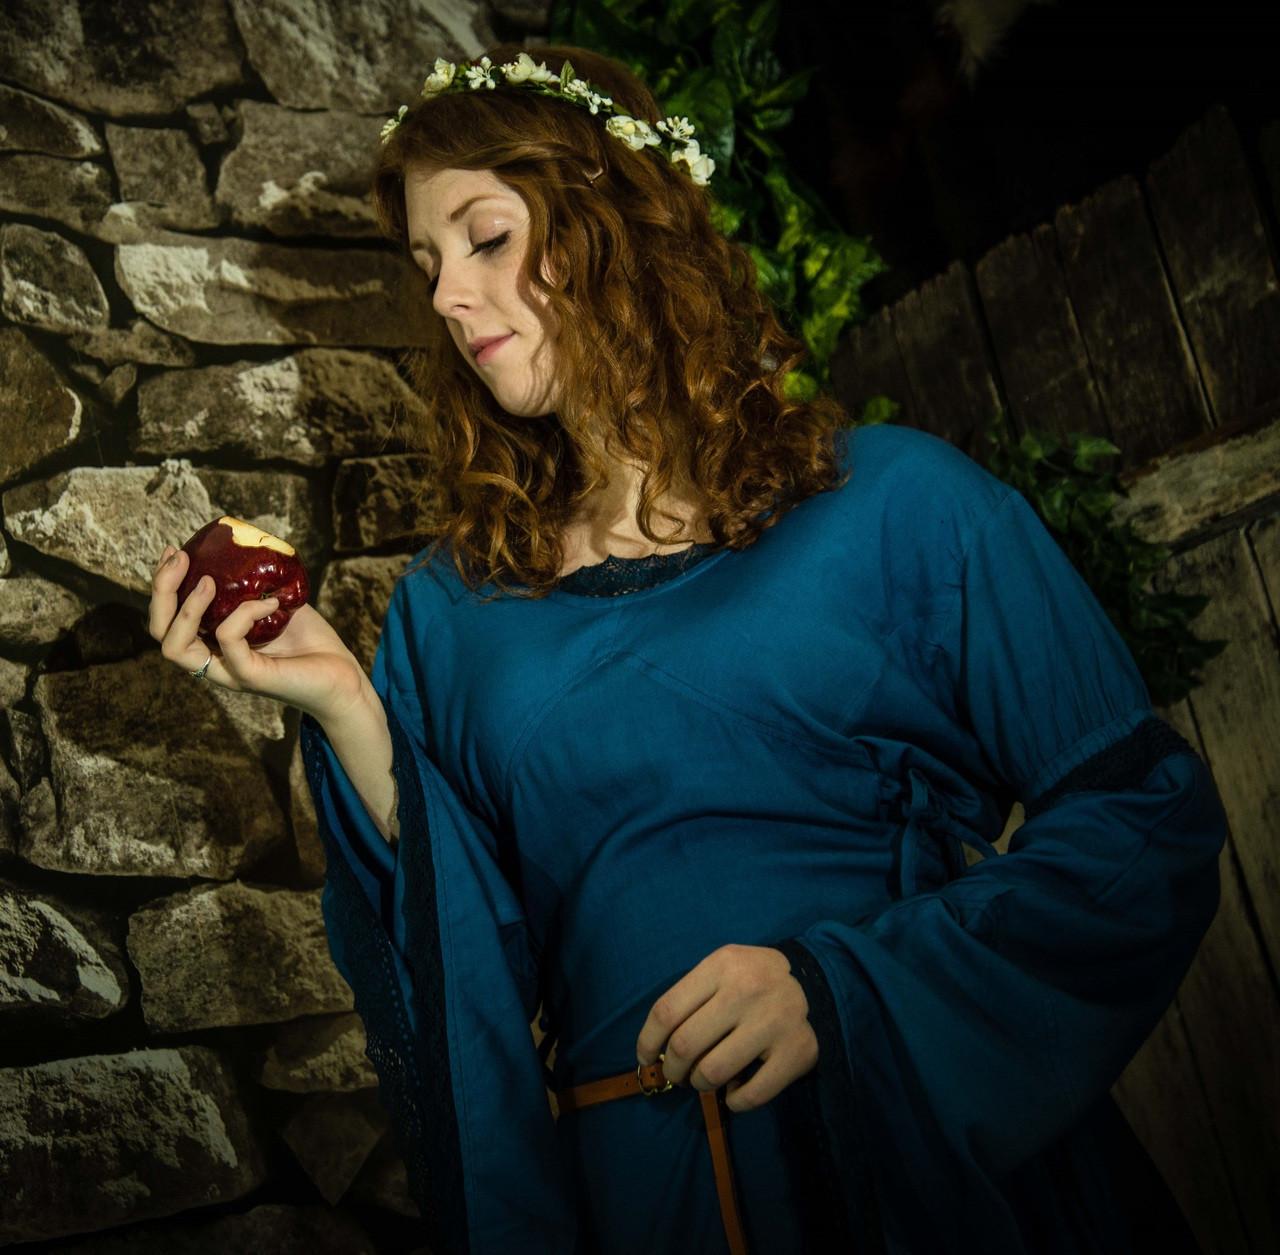 Blue Medieval Dress